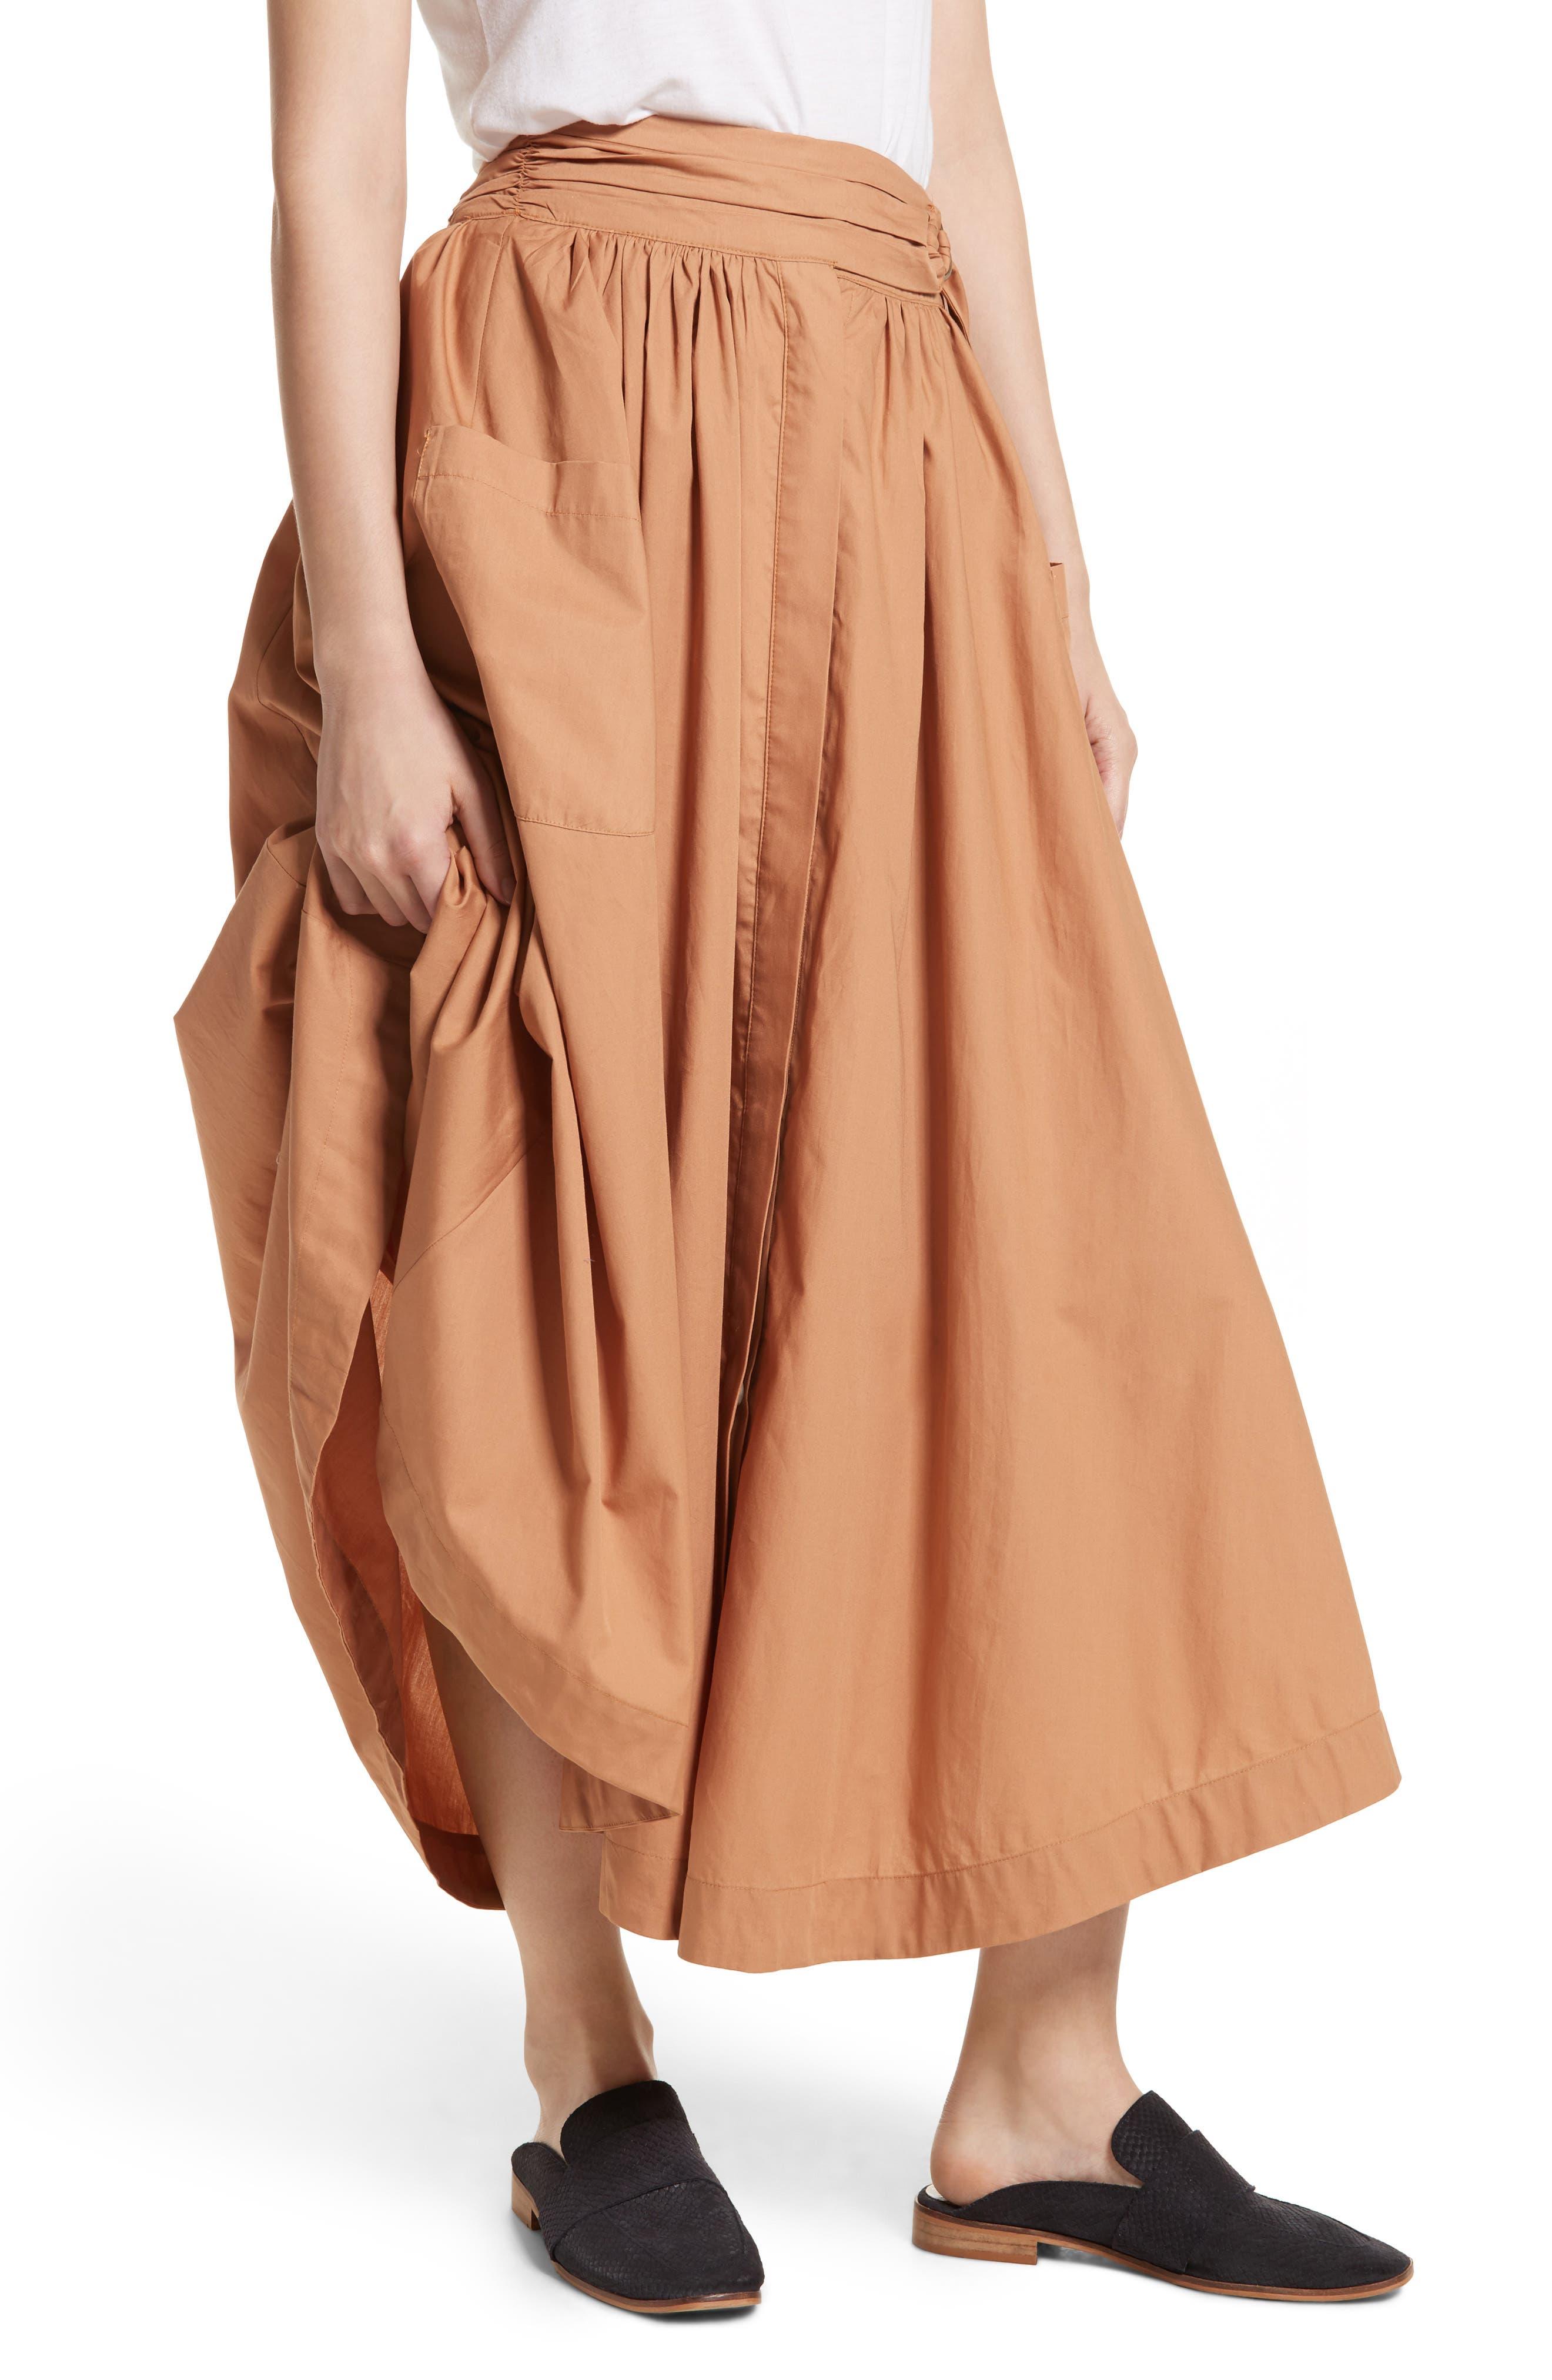 Dream of Me Midi Skirt,                             Main thumbnail 1, color,                             230